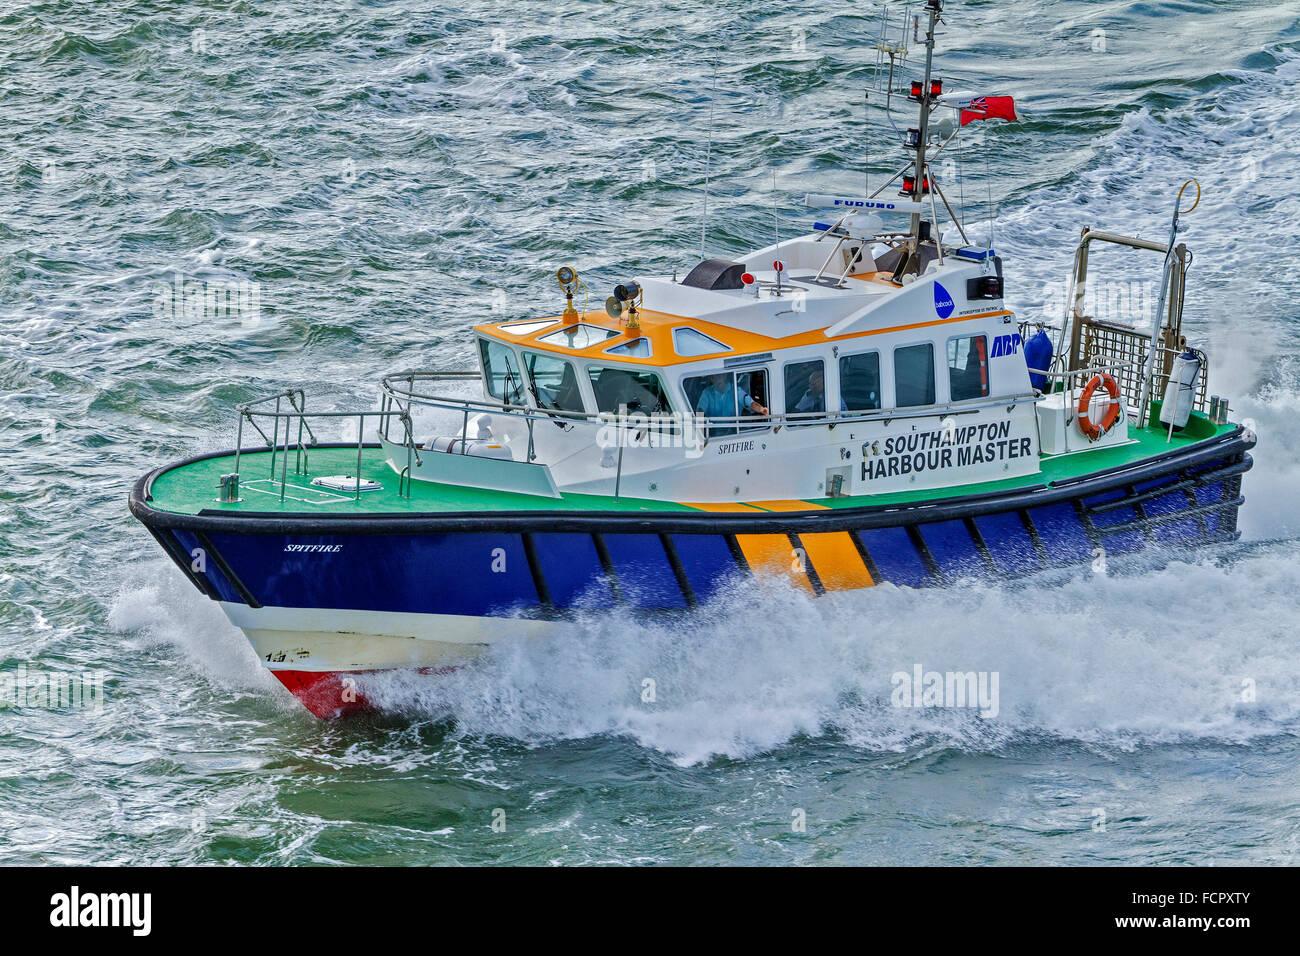 Harbour Masters Boat Southampton Hampshire UK - Stock Image